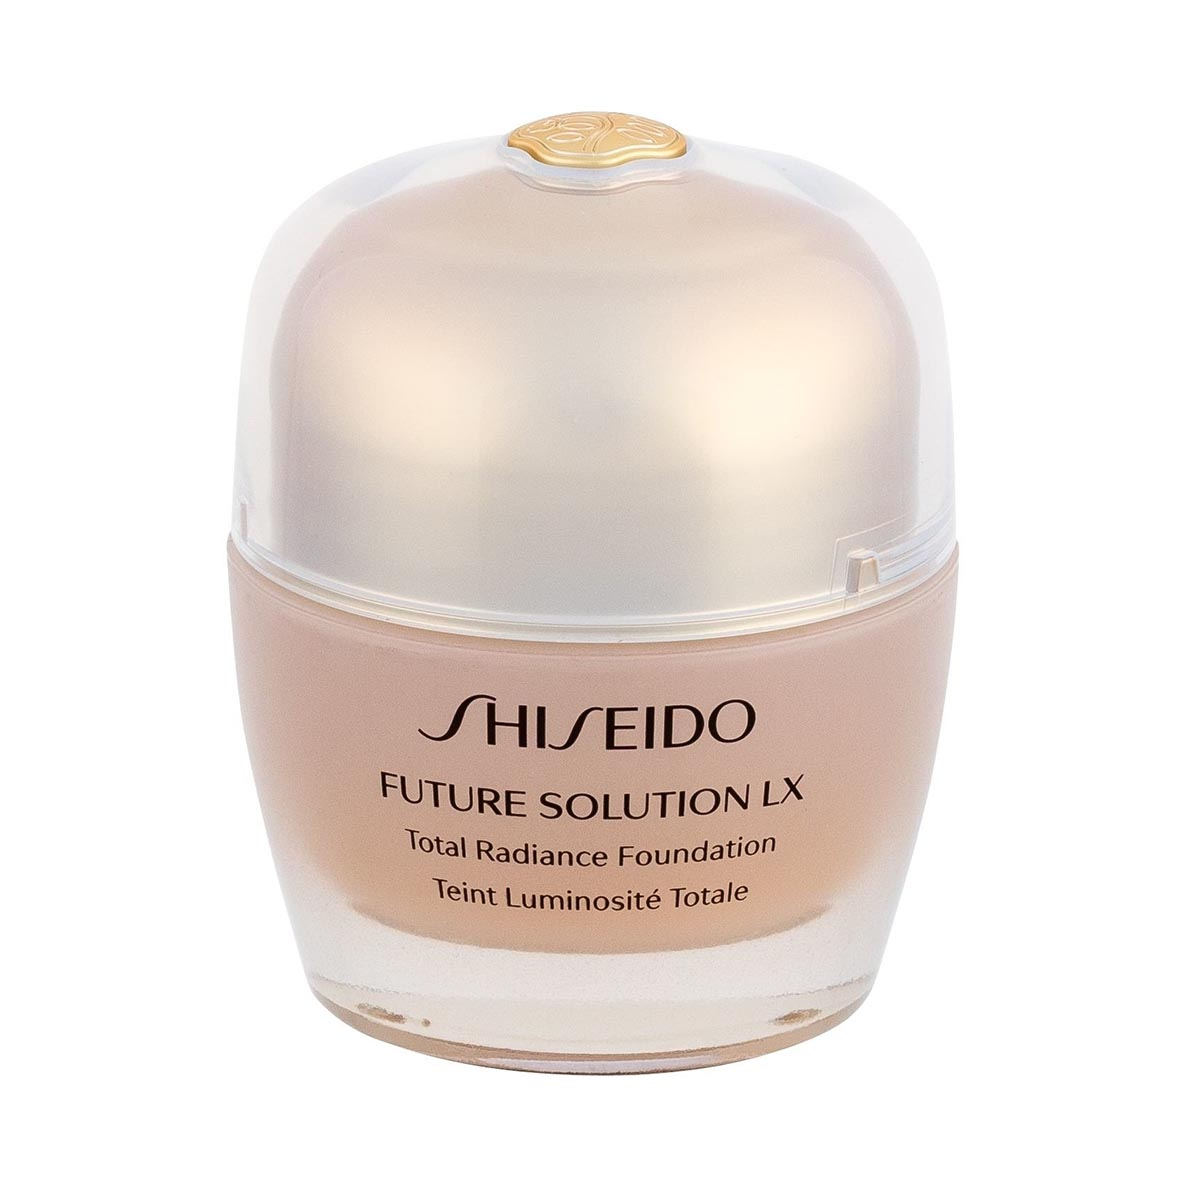 Shiseido future solution lx total radiance foundation g3 golden